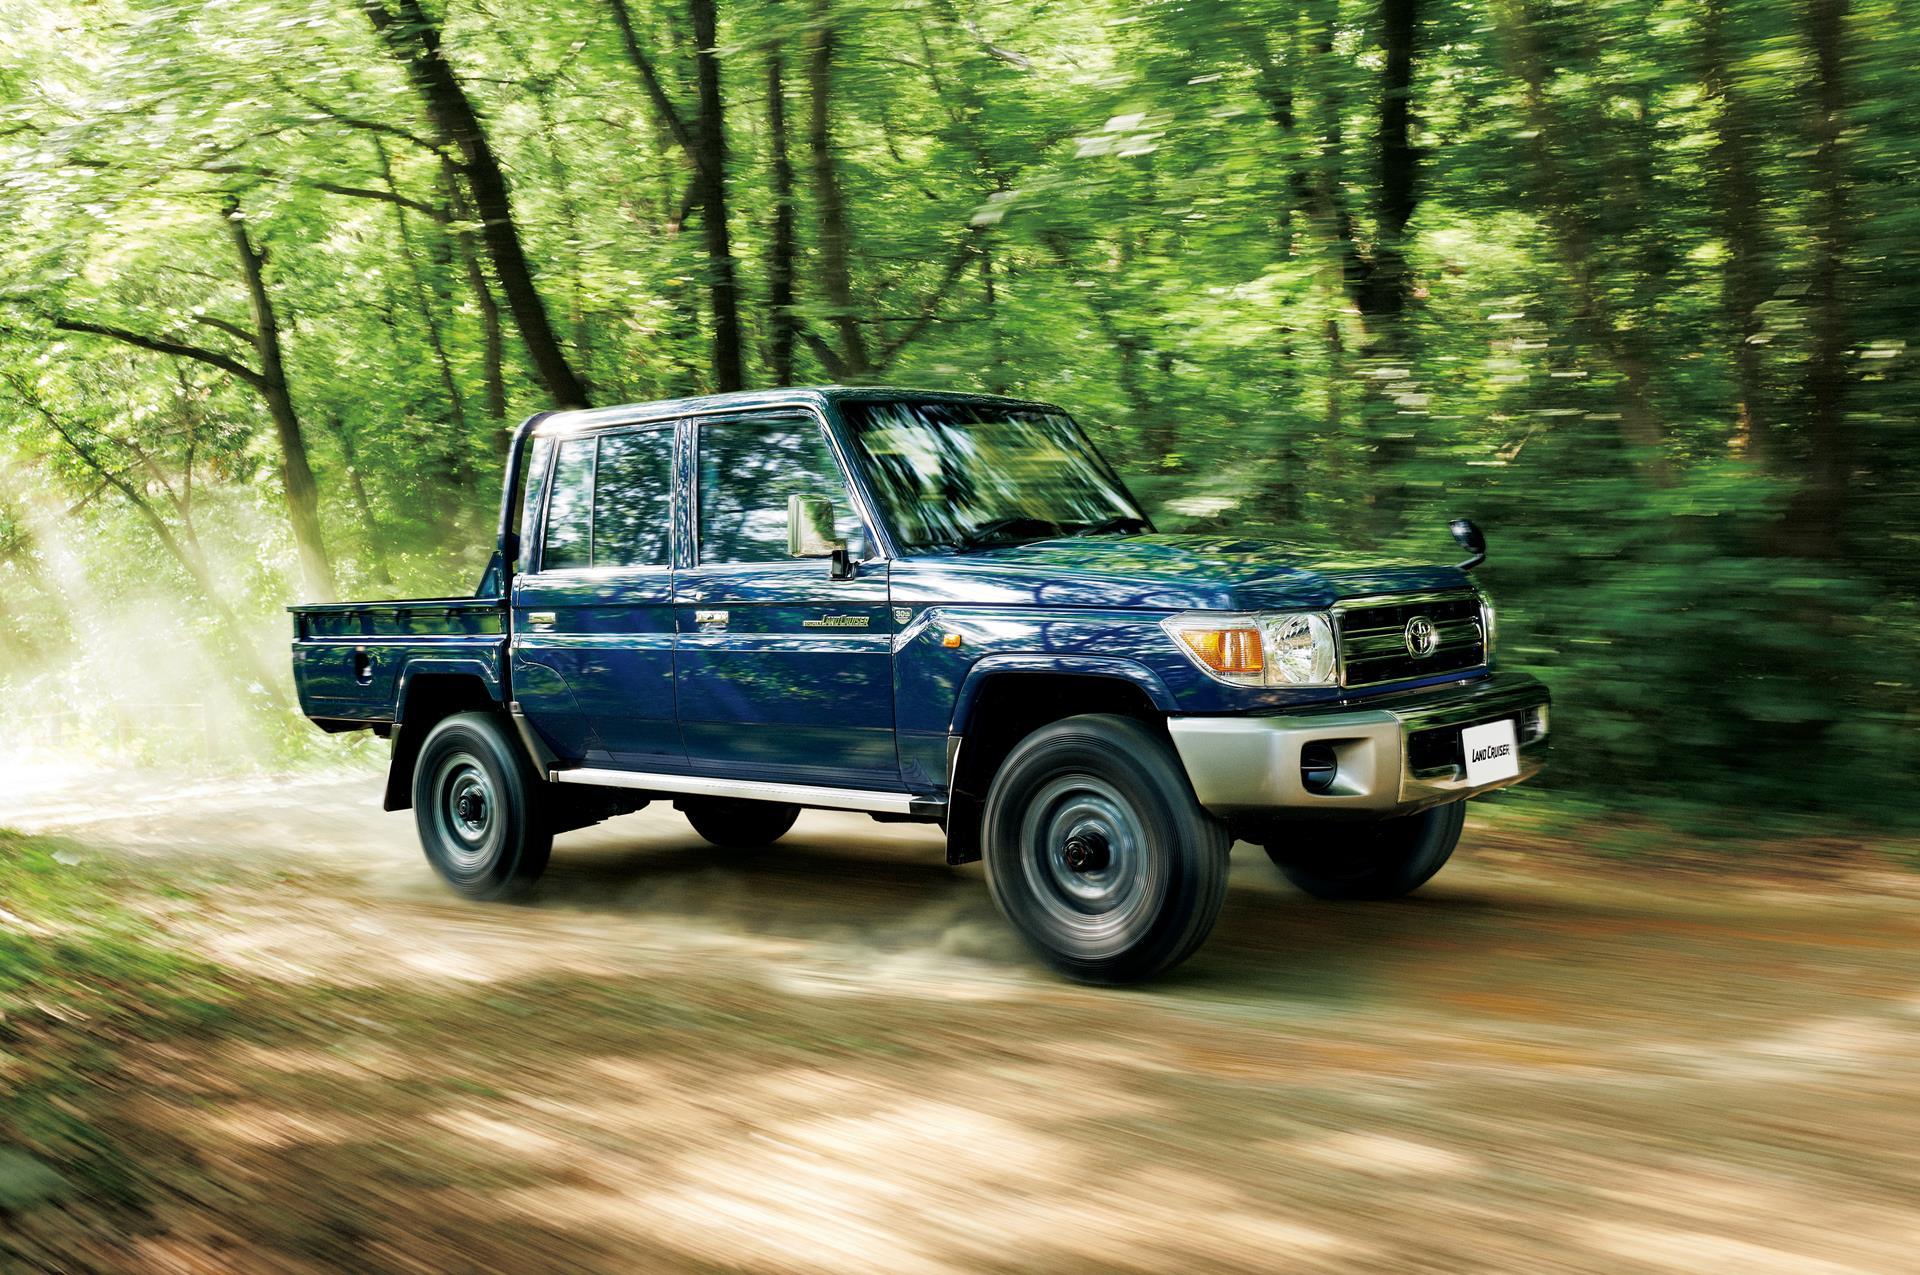 30 Years Of Toyota Land Cruiser 70 - Celebrating With ...